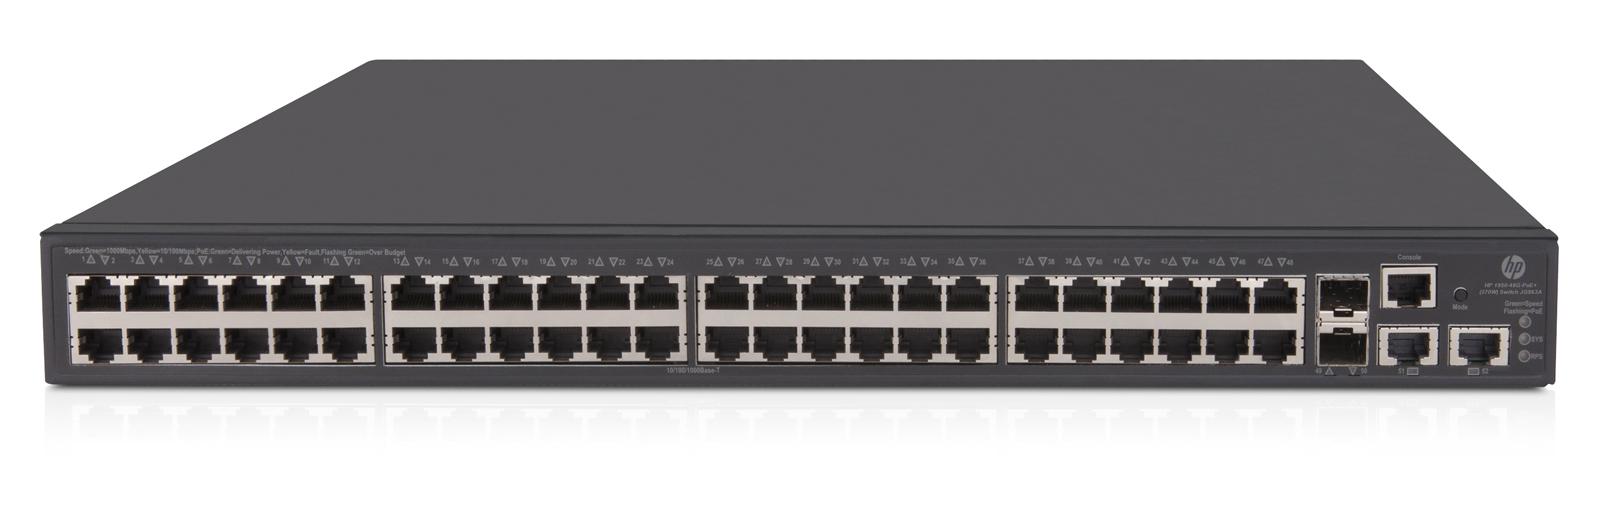 Hewlett Packard Enterprise OfficeConnect 1950 48G 2SFP+ 2XGT PoE+ Gestionado L3 Gigabit Ethernet (10/100/1000) Gris 1U Energía sobre Ethernet (PoE)